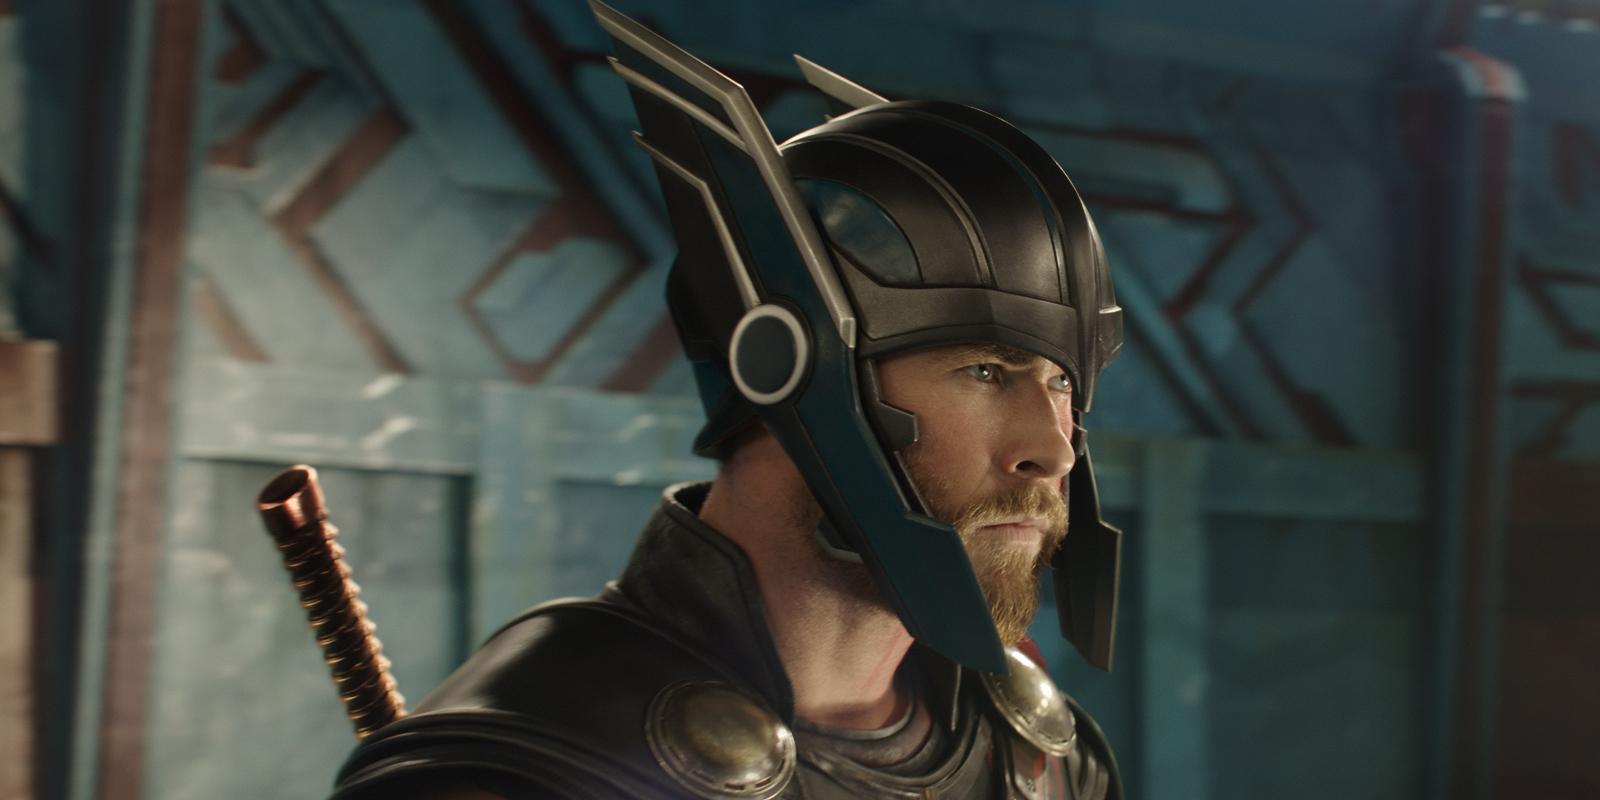 Neuer Thor Film